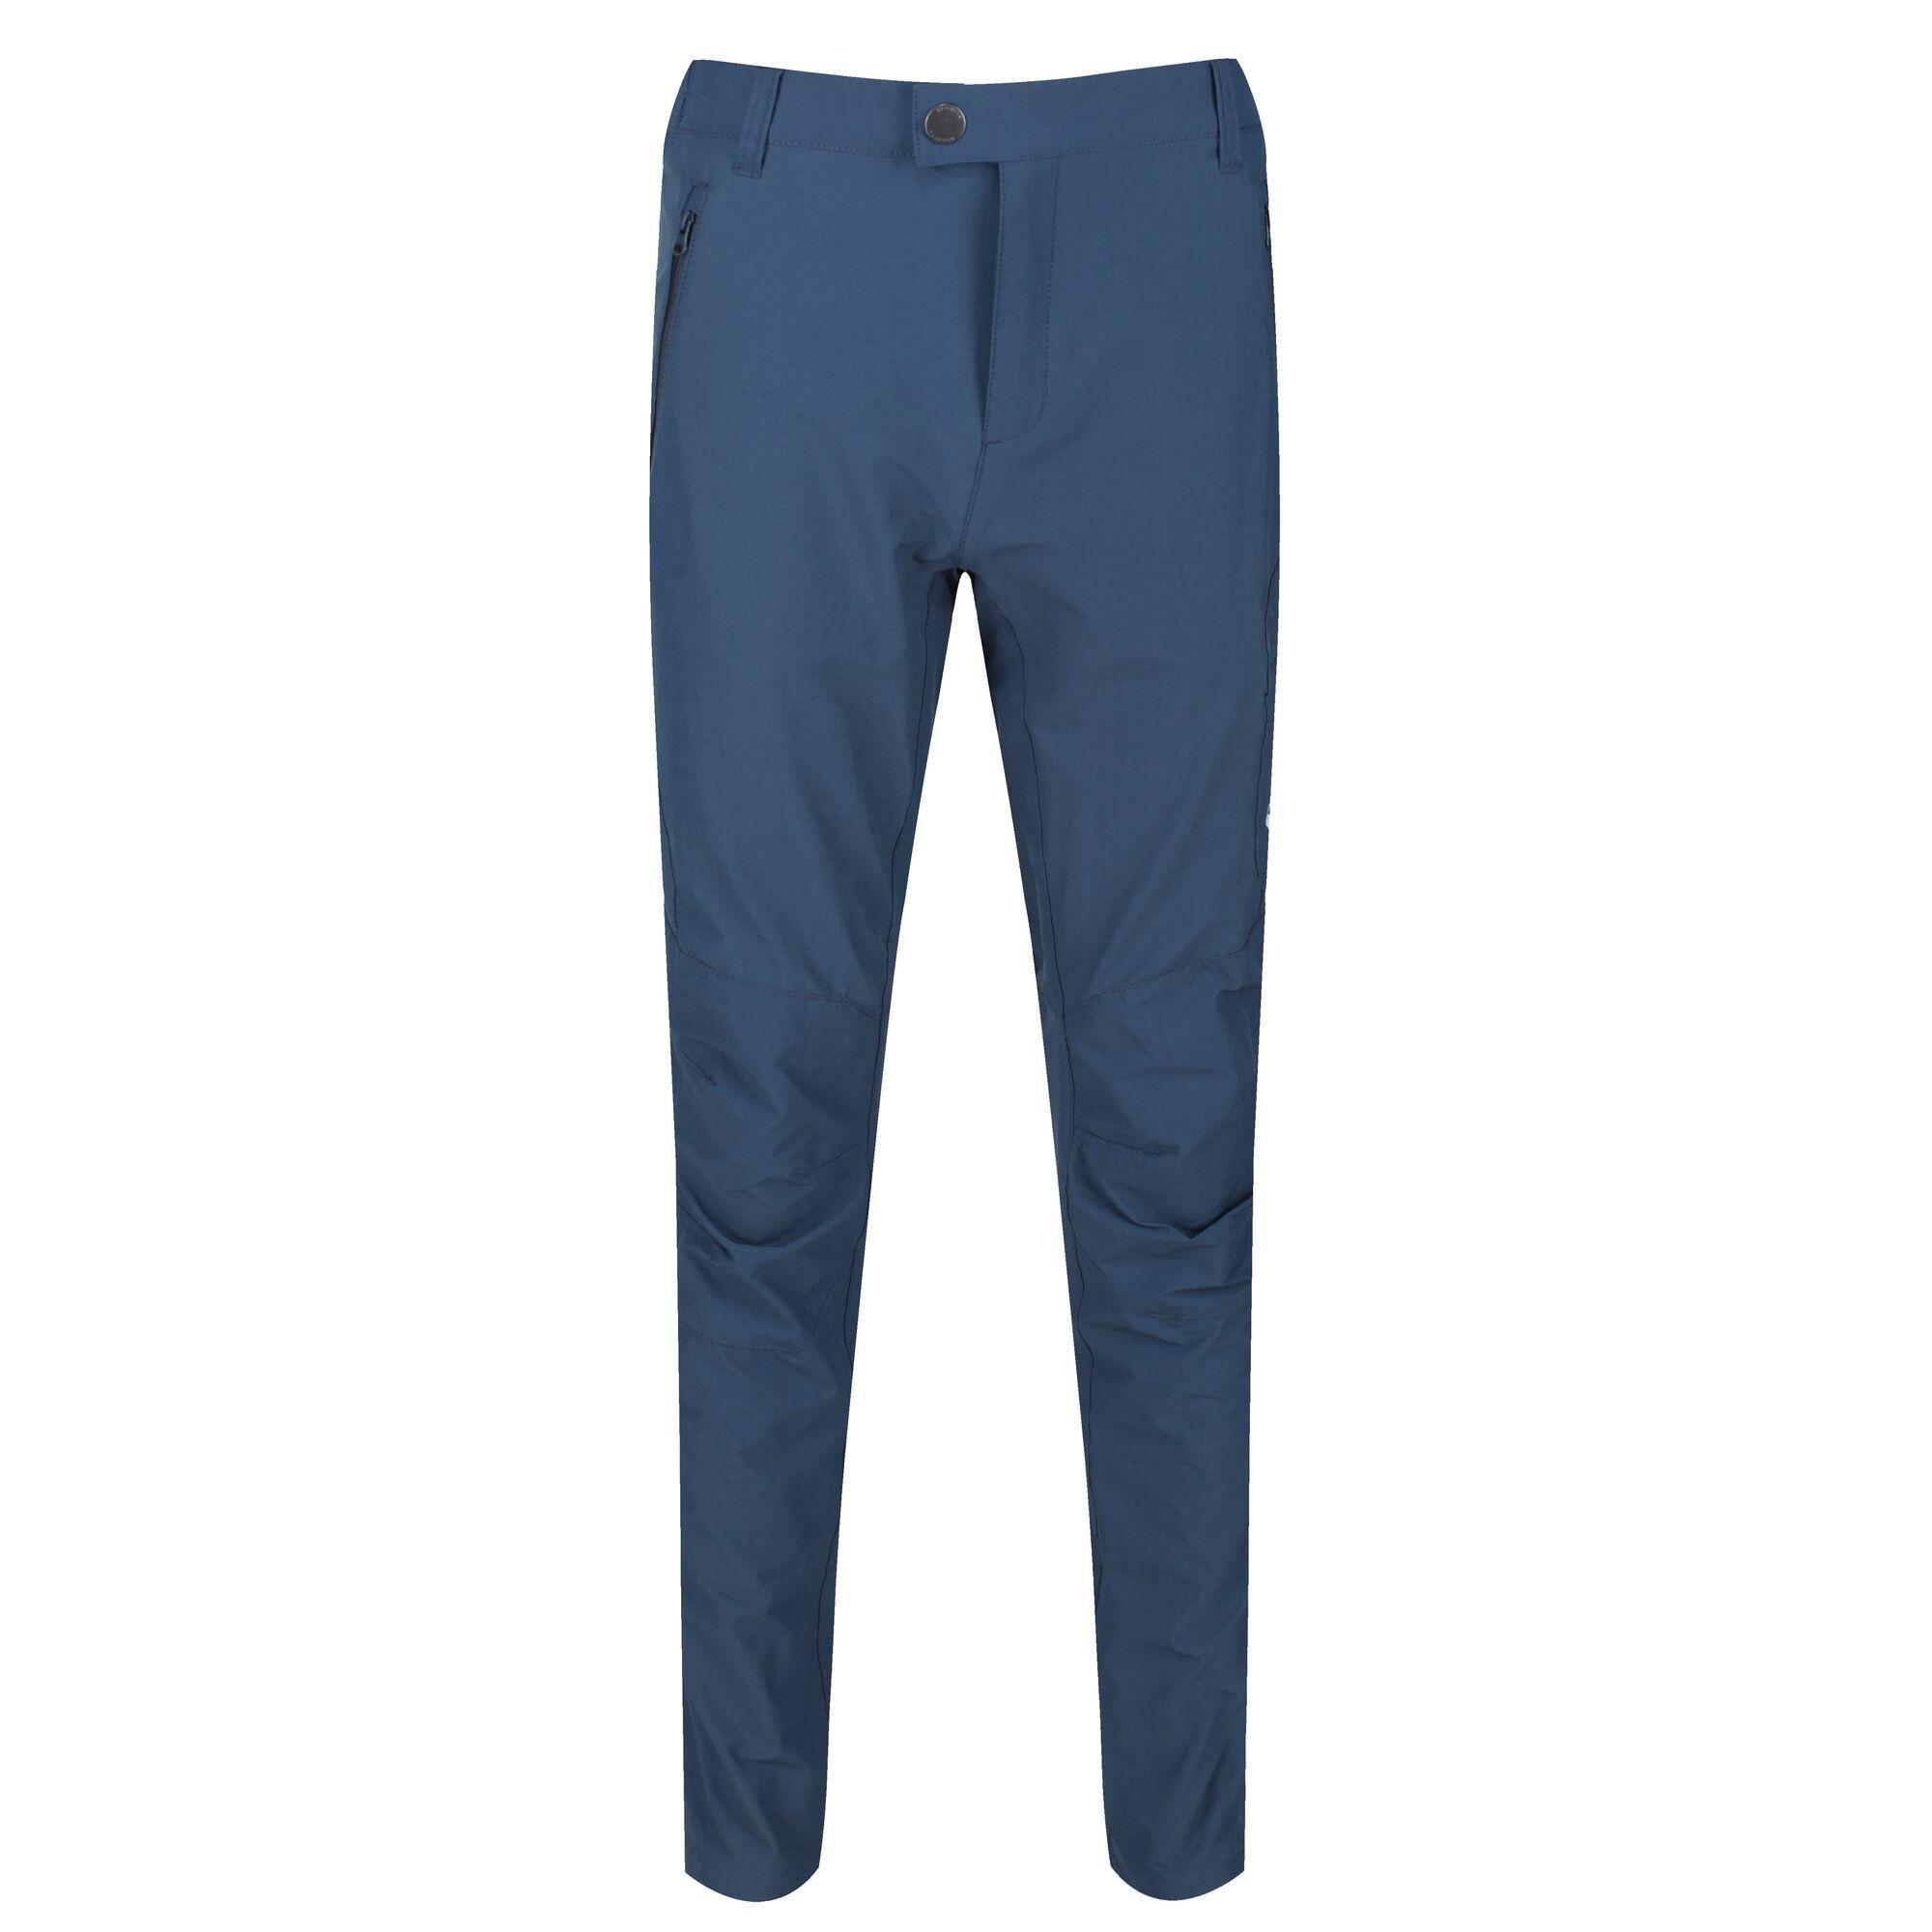 Regatta Mens Highton Hiking Trousers (34S) (Dark Denim)